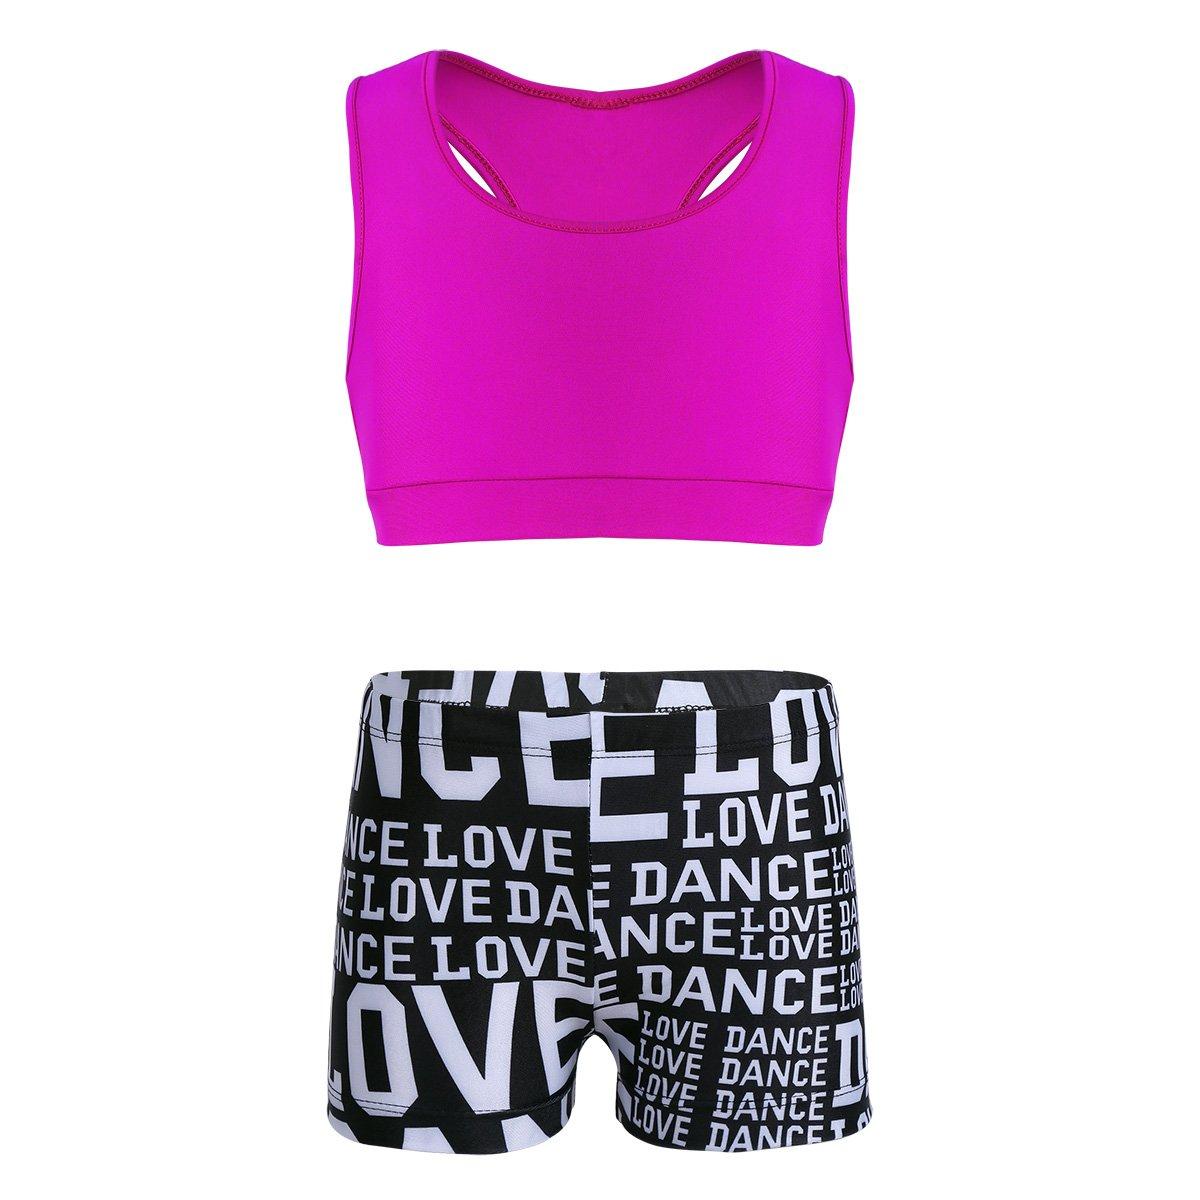 MSemis Girls' Kids 2-Piece Sport Dance Outfit Crop Top with Booty Shorts Gymnastics Leotard Dancing Swimwear Rose & Black 5-6